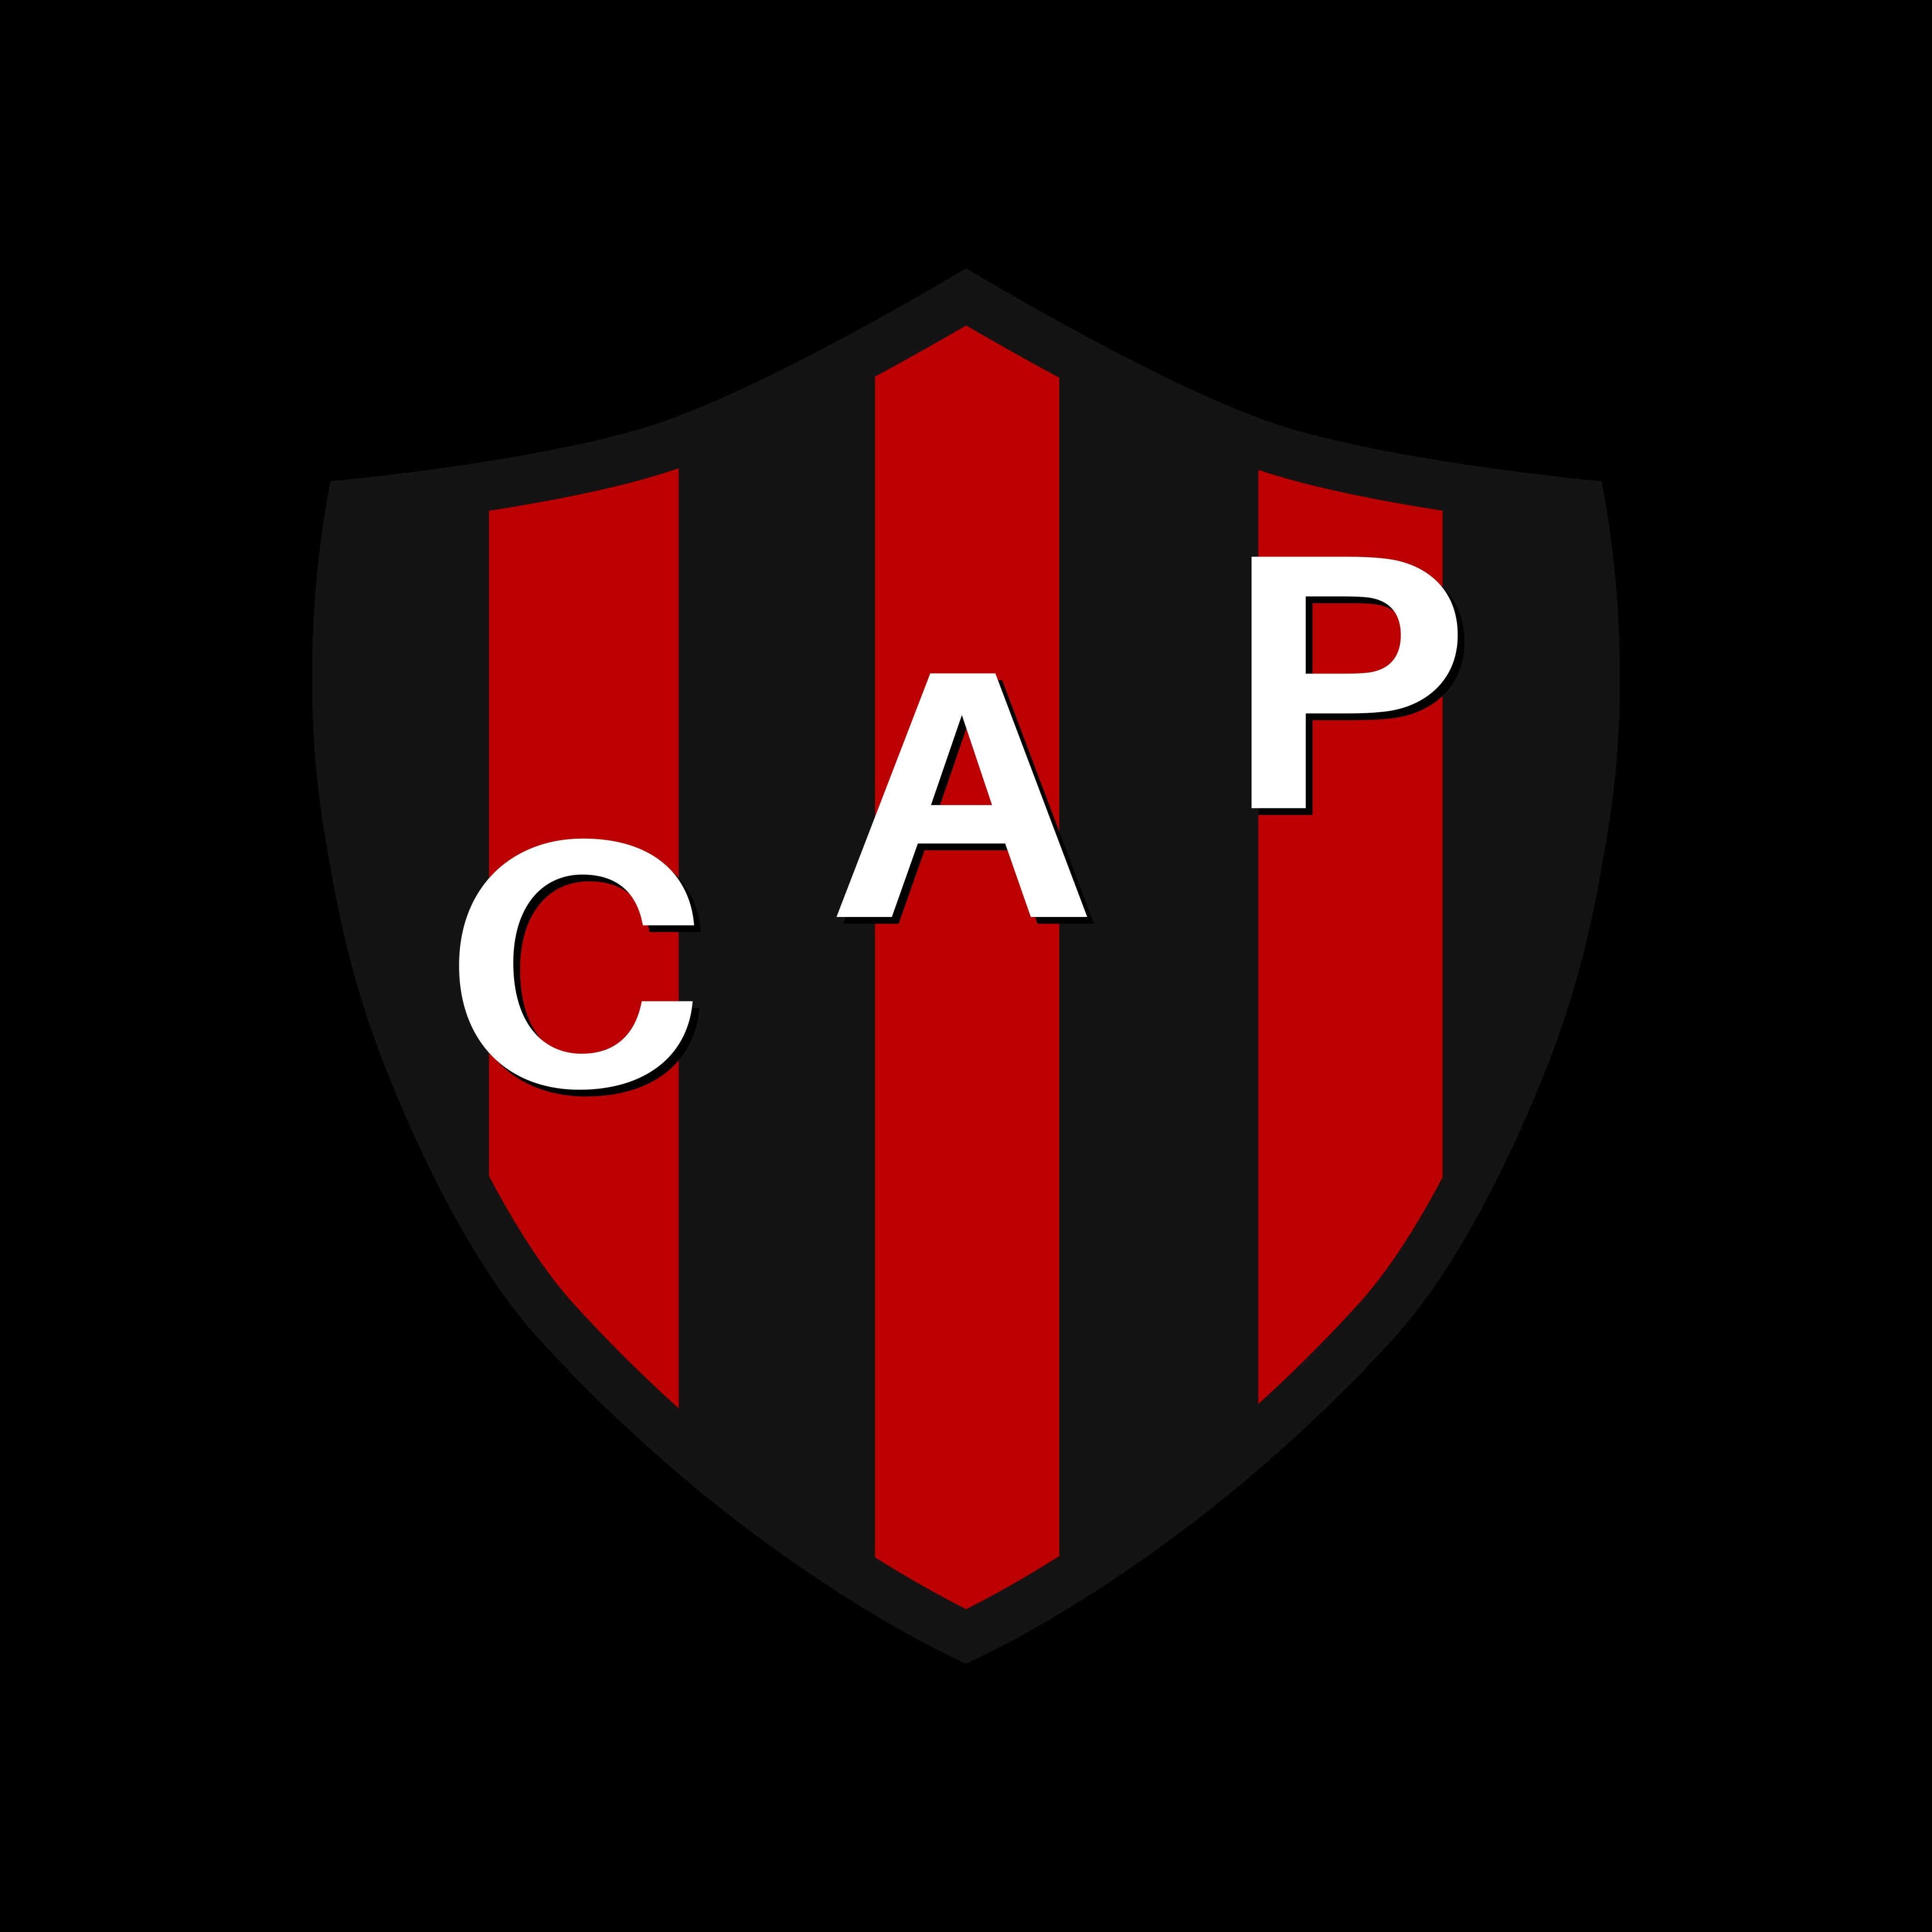 ca patronato logo 0 - Club Atlético Patronato Logo – Escudo